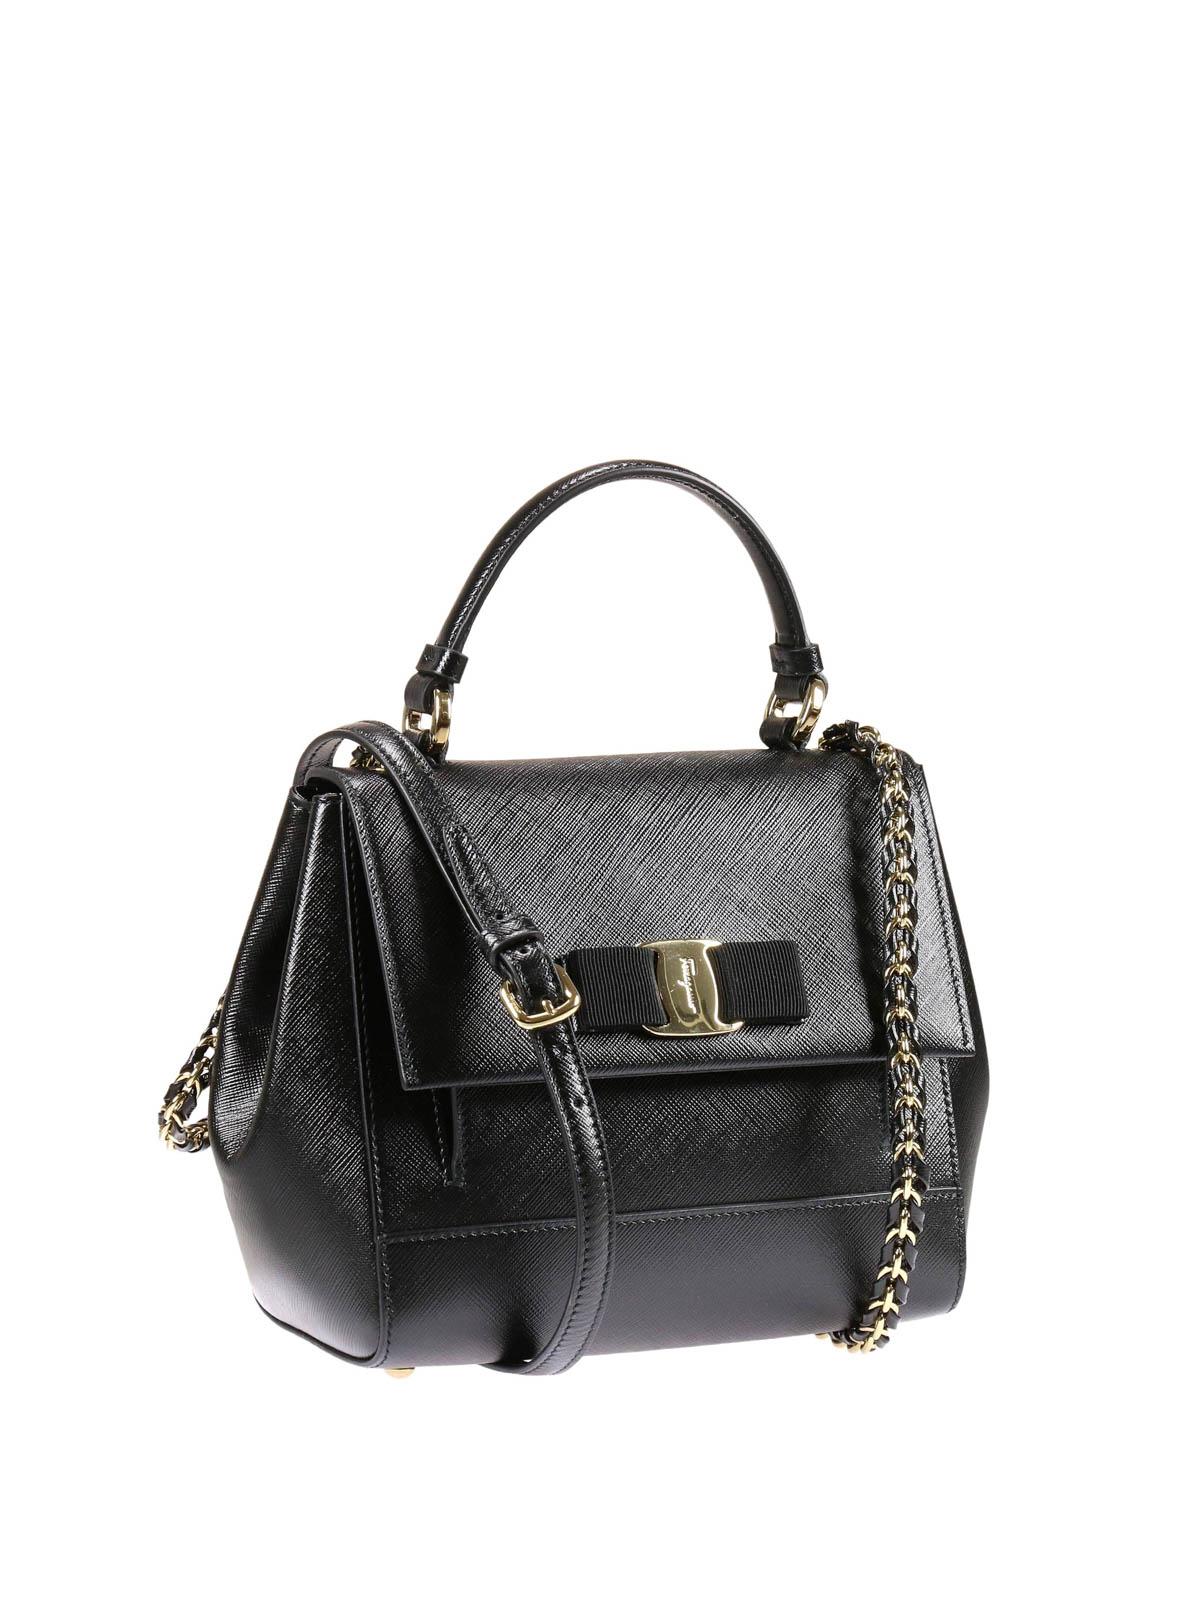 salvatore ferragamo vara bow detail leather bag cross body bags 21f570 629103. Black Bedroom Furniture Sets. Home Design Ideas